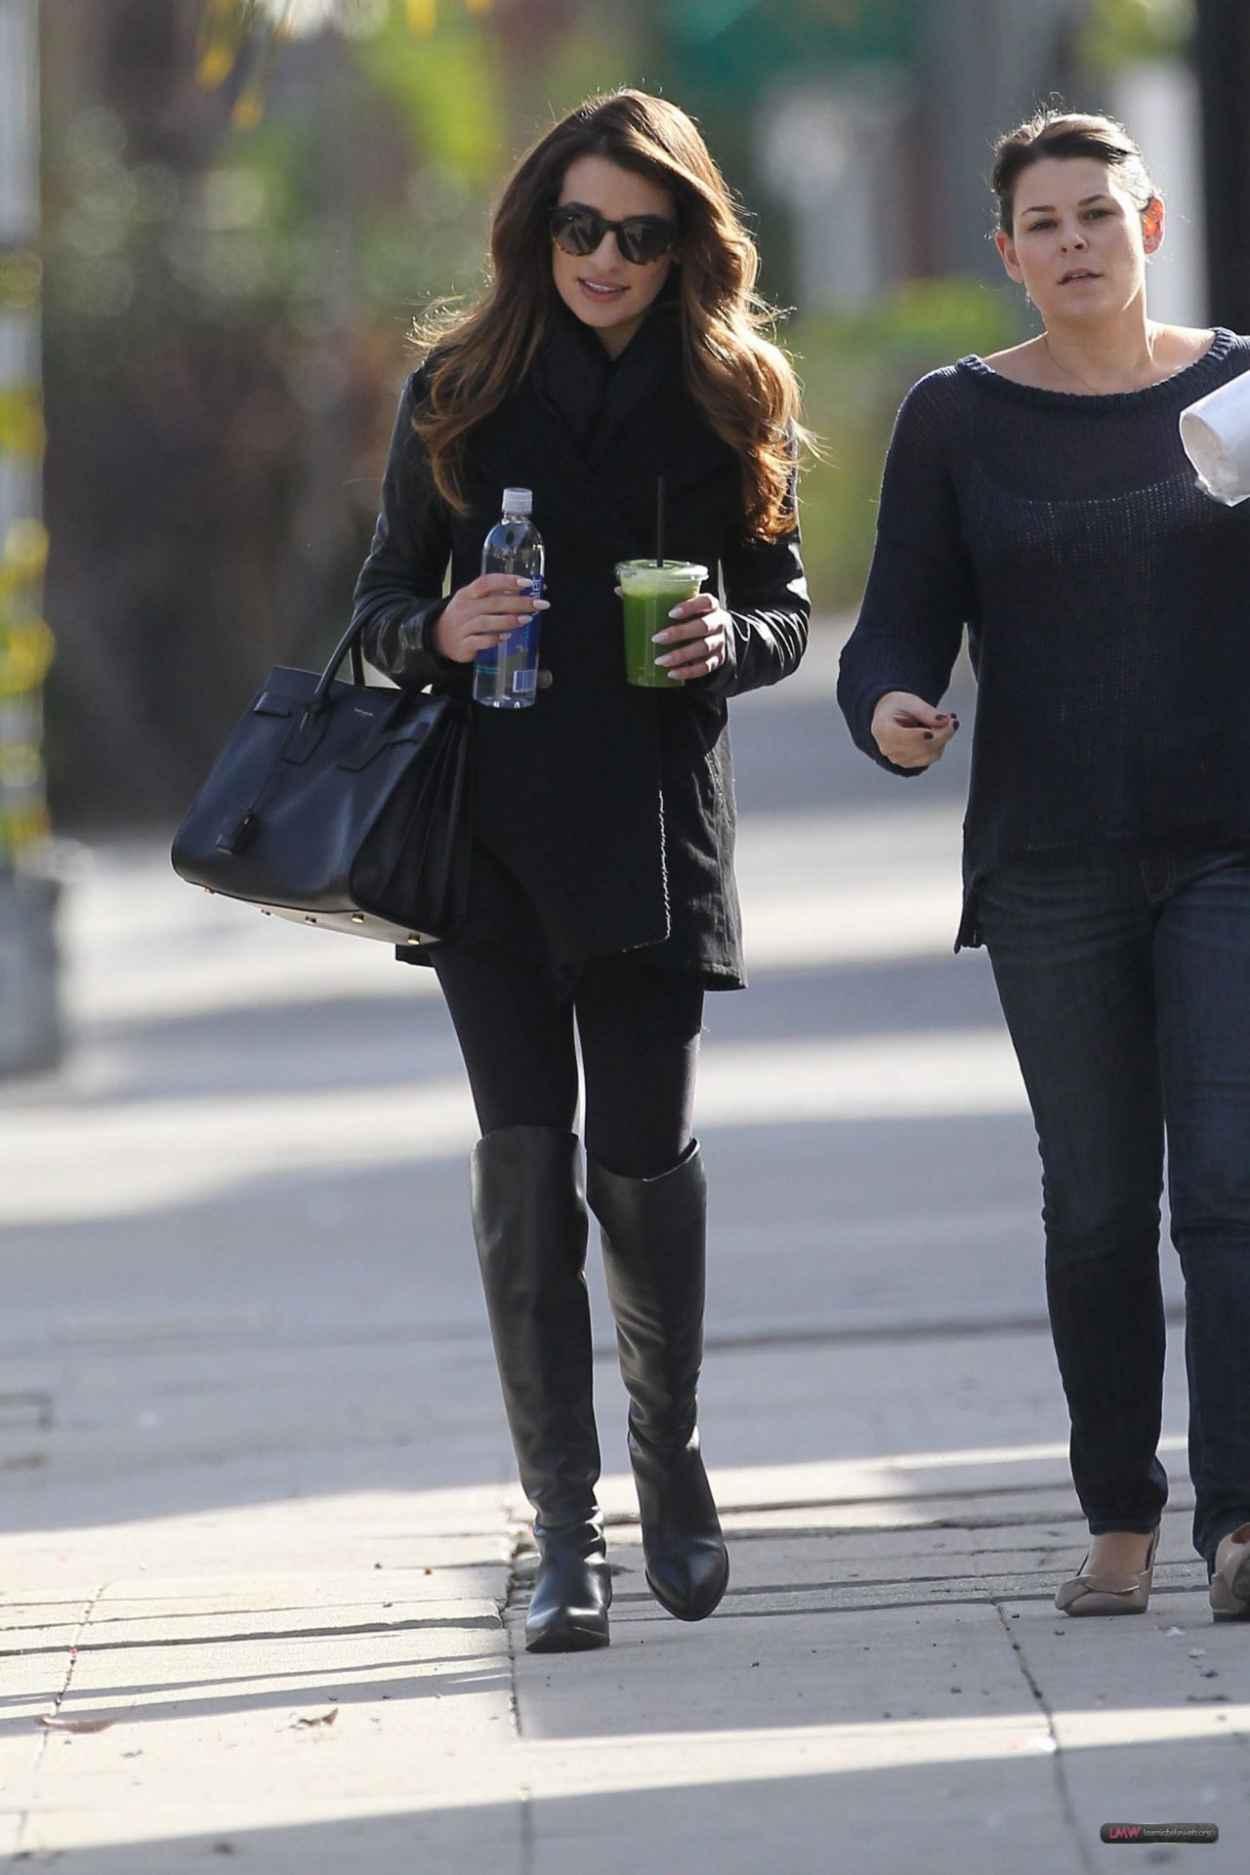 Lea Michele Street Style - Leaving Studio in W. Hollywood - December 2015-3